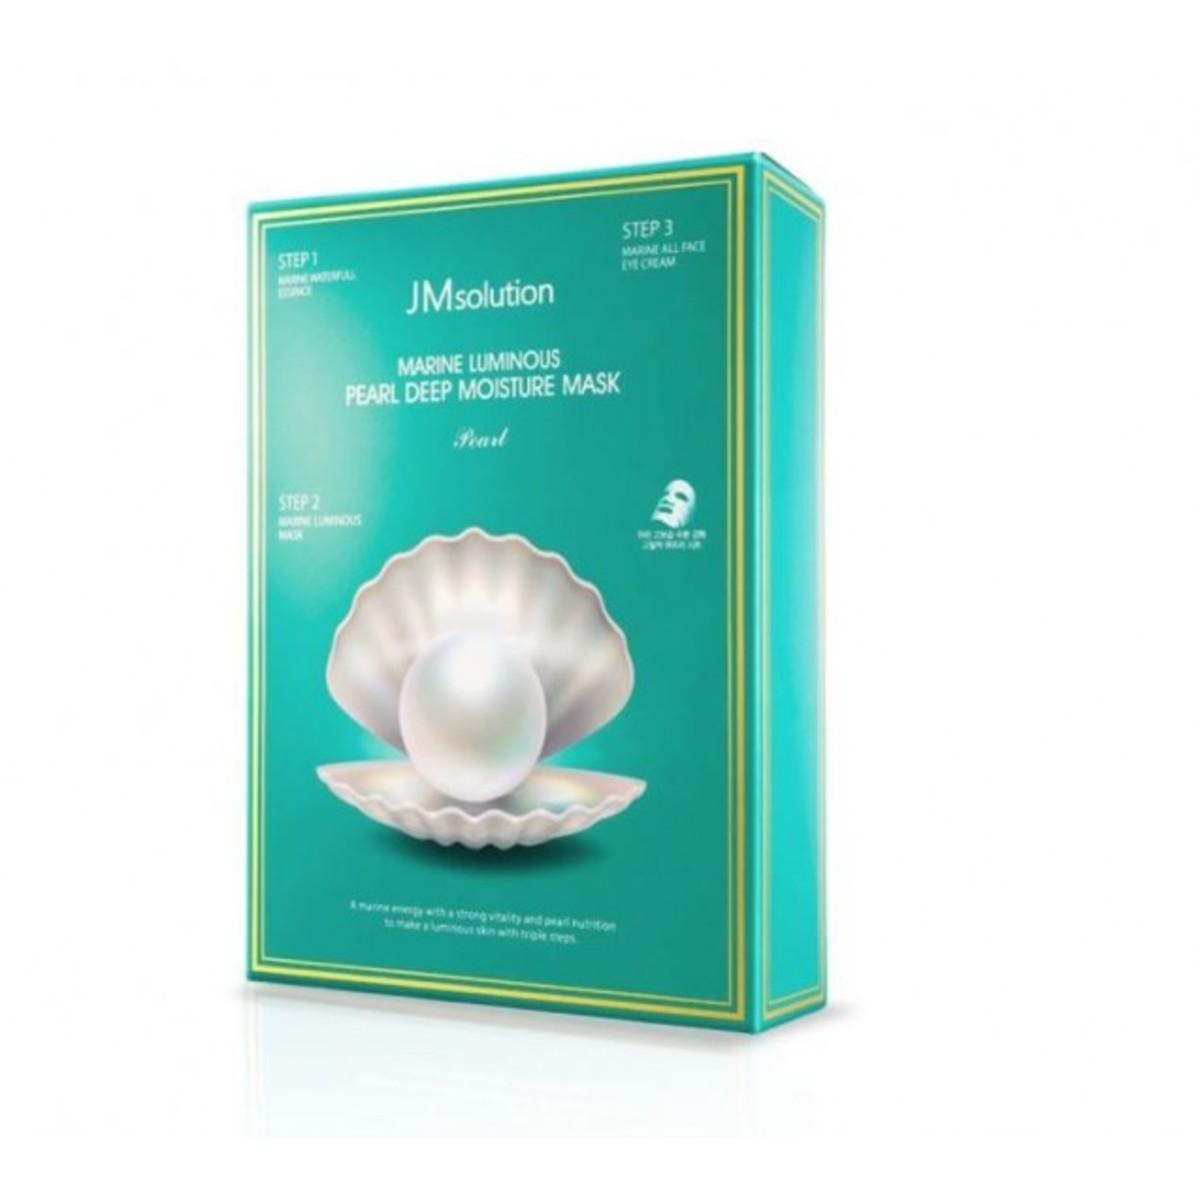 Marine Luminous Pearl Deep Moisture Mask (10pcs/pack) -[Parallel Import Product]